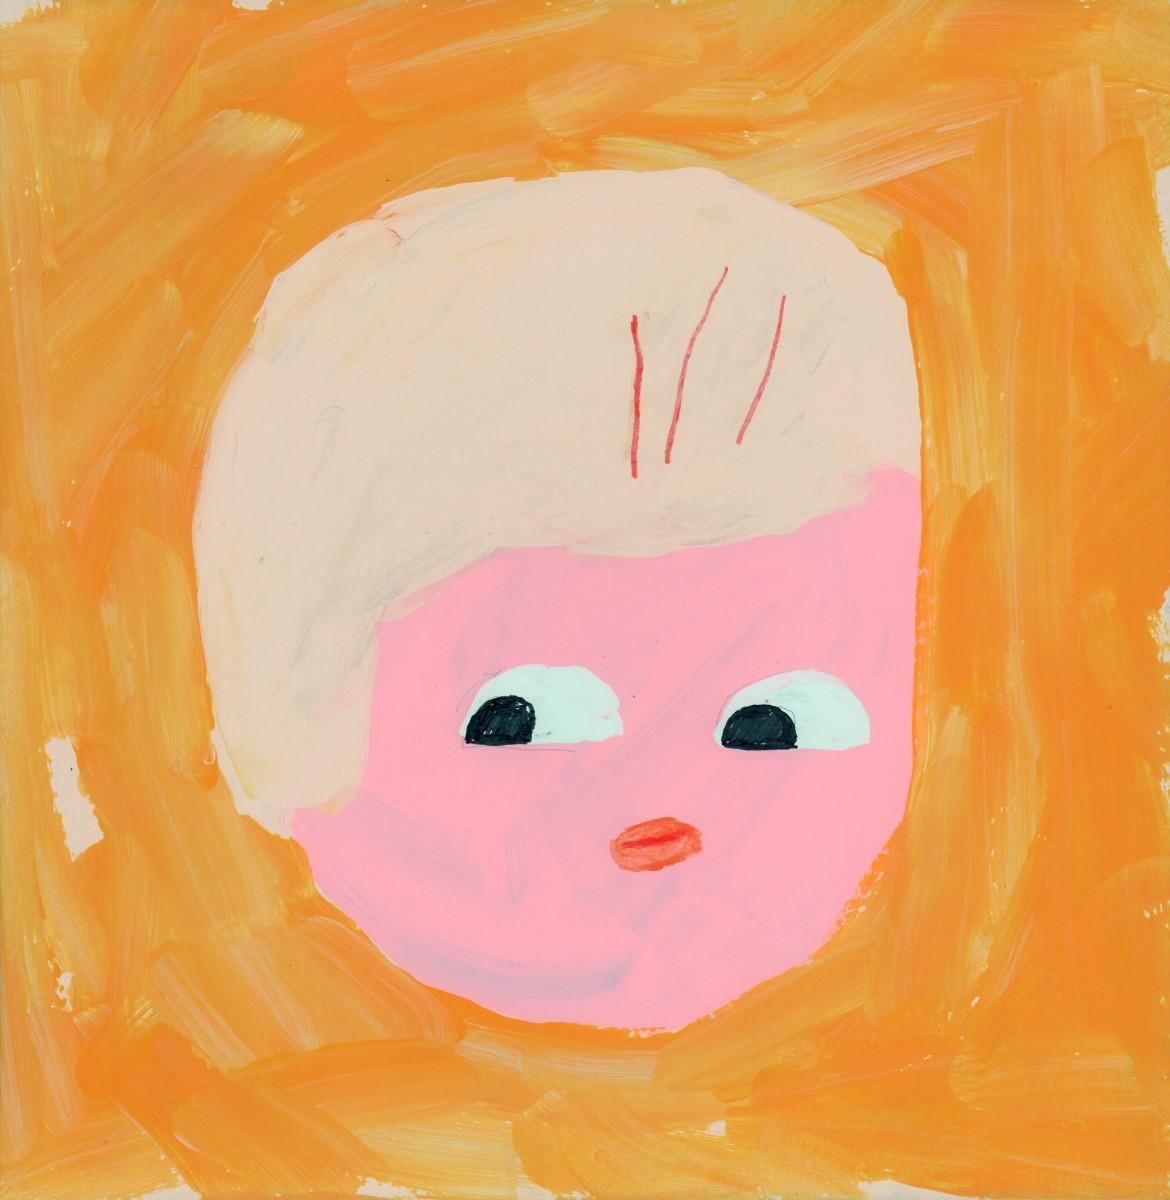 pink-baby-d4504bb2f635f1665fe28cb1a012a47d